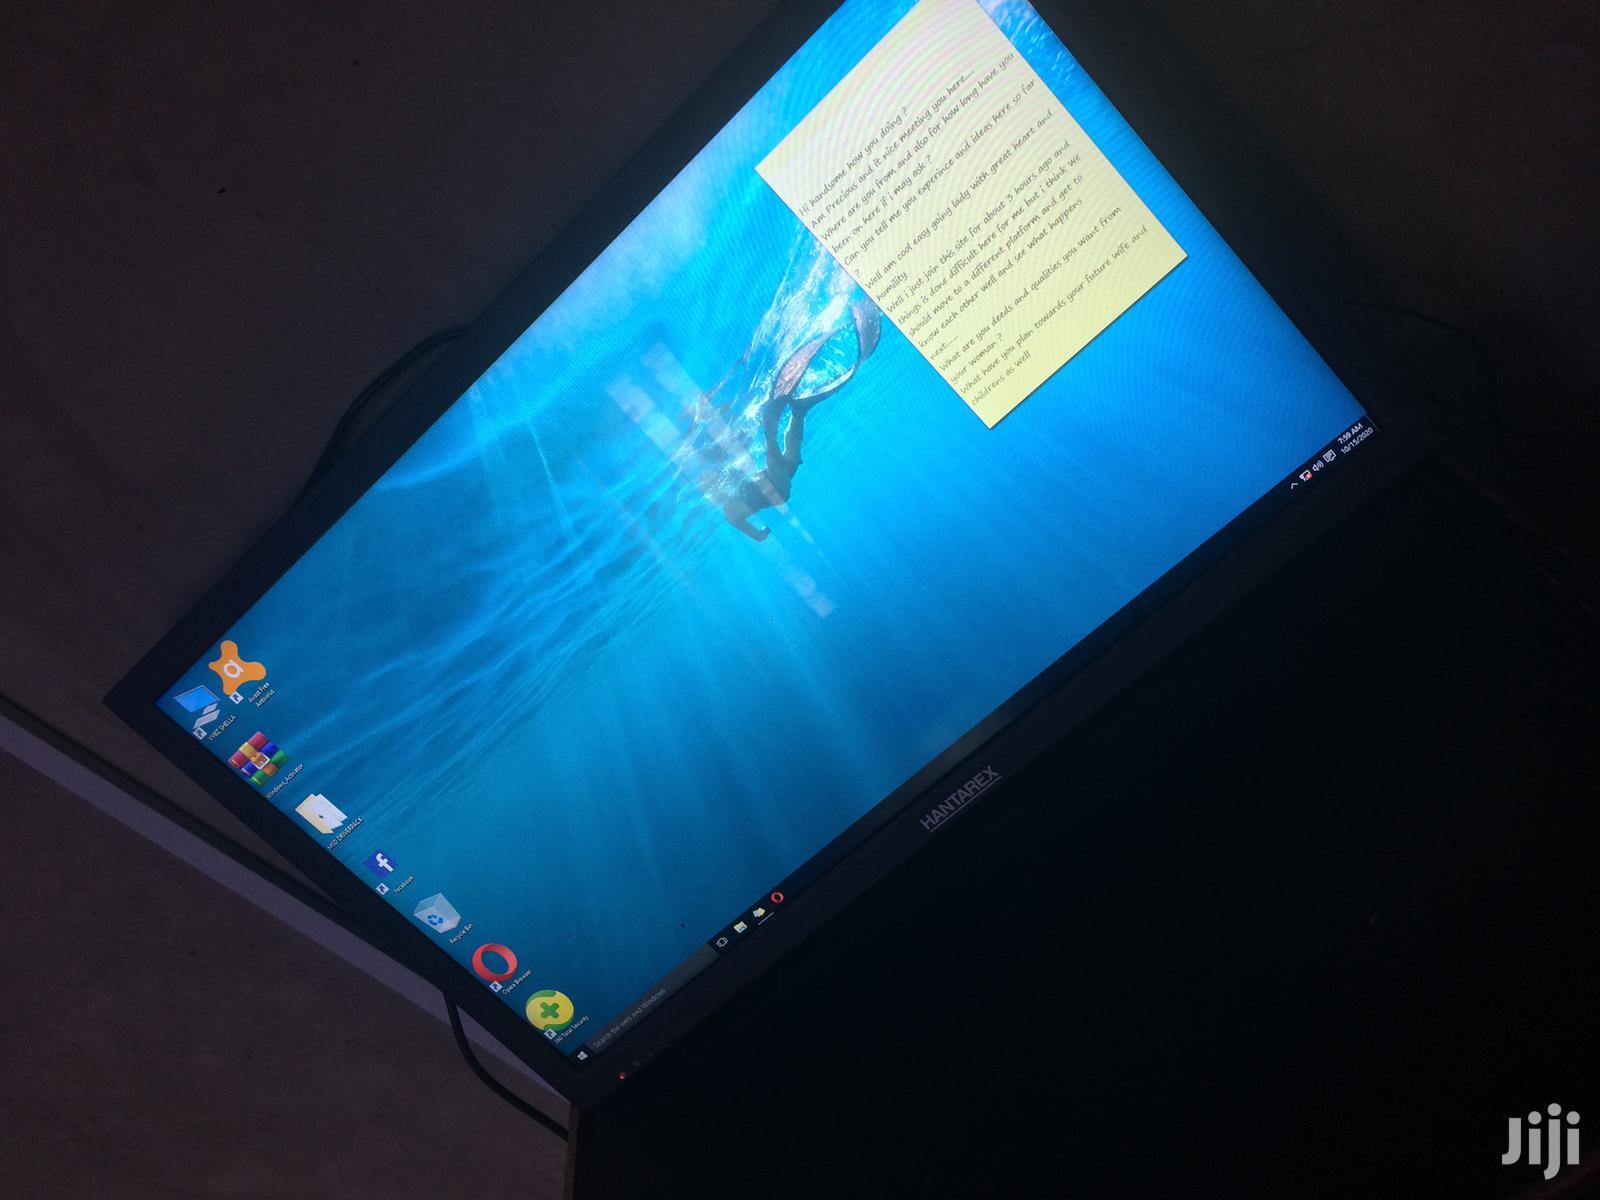 New Desktop Computer Laptop 4GB Intel Core i5 SSD 128GB | Laptops & Computers for sale in Darkuman, Greater Accra, Ghana